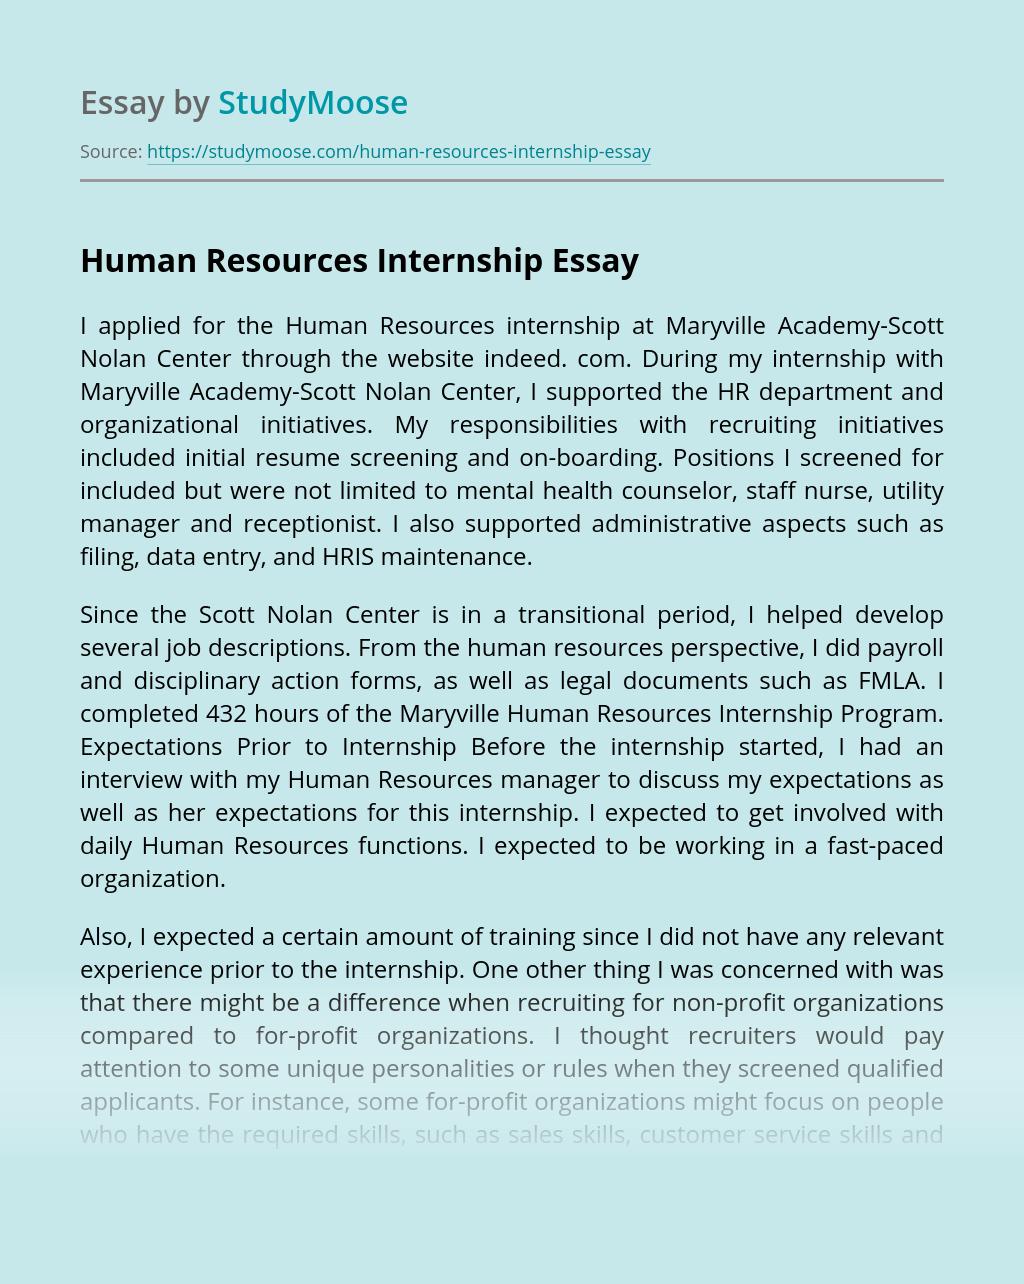 Human Resources Internship